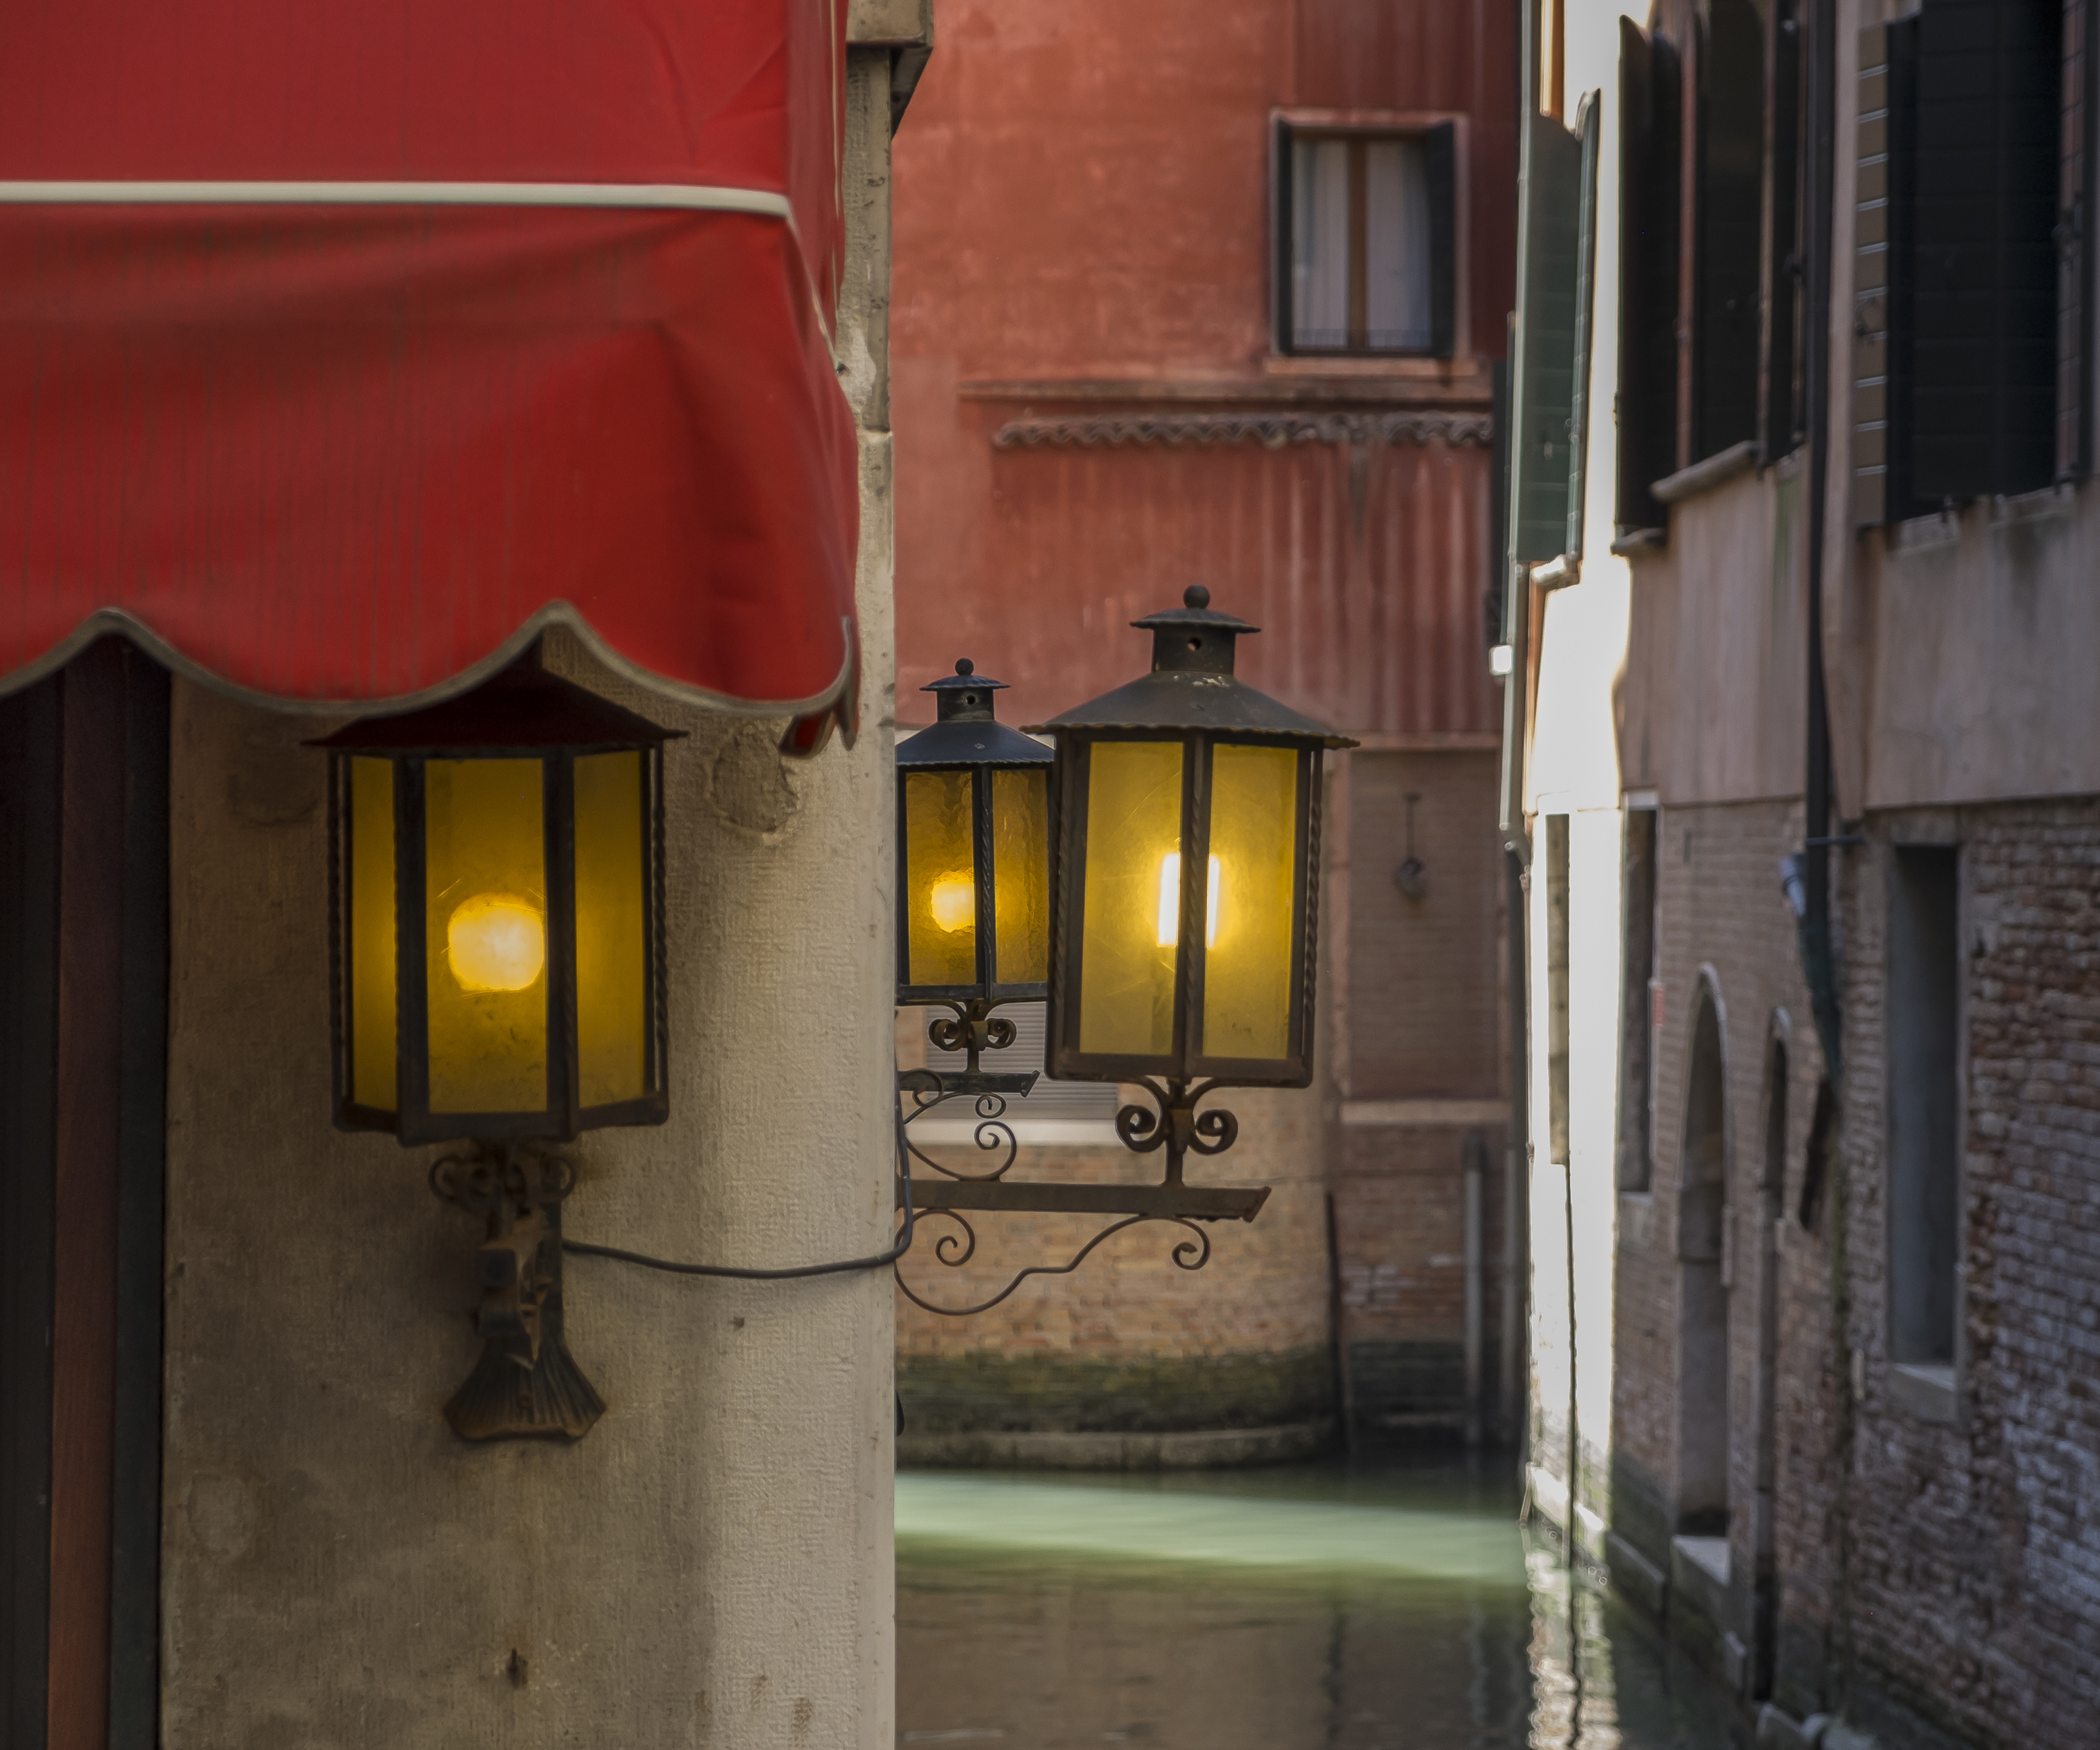 Venice-Walls&Lights-20140525-DSCF6291.jpg